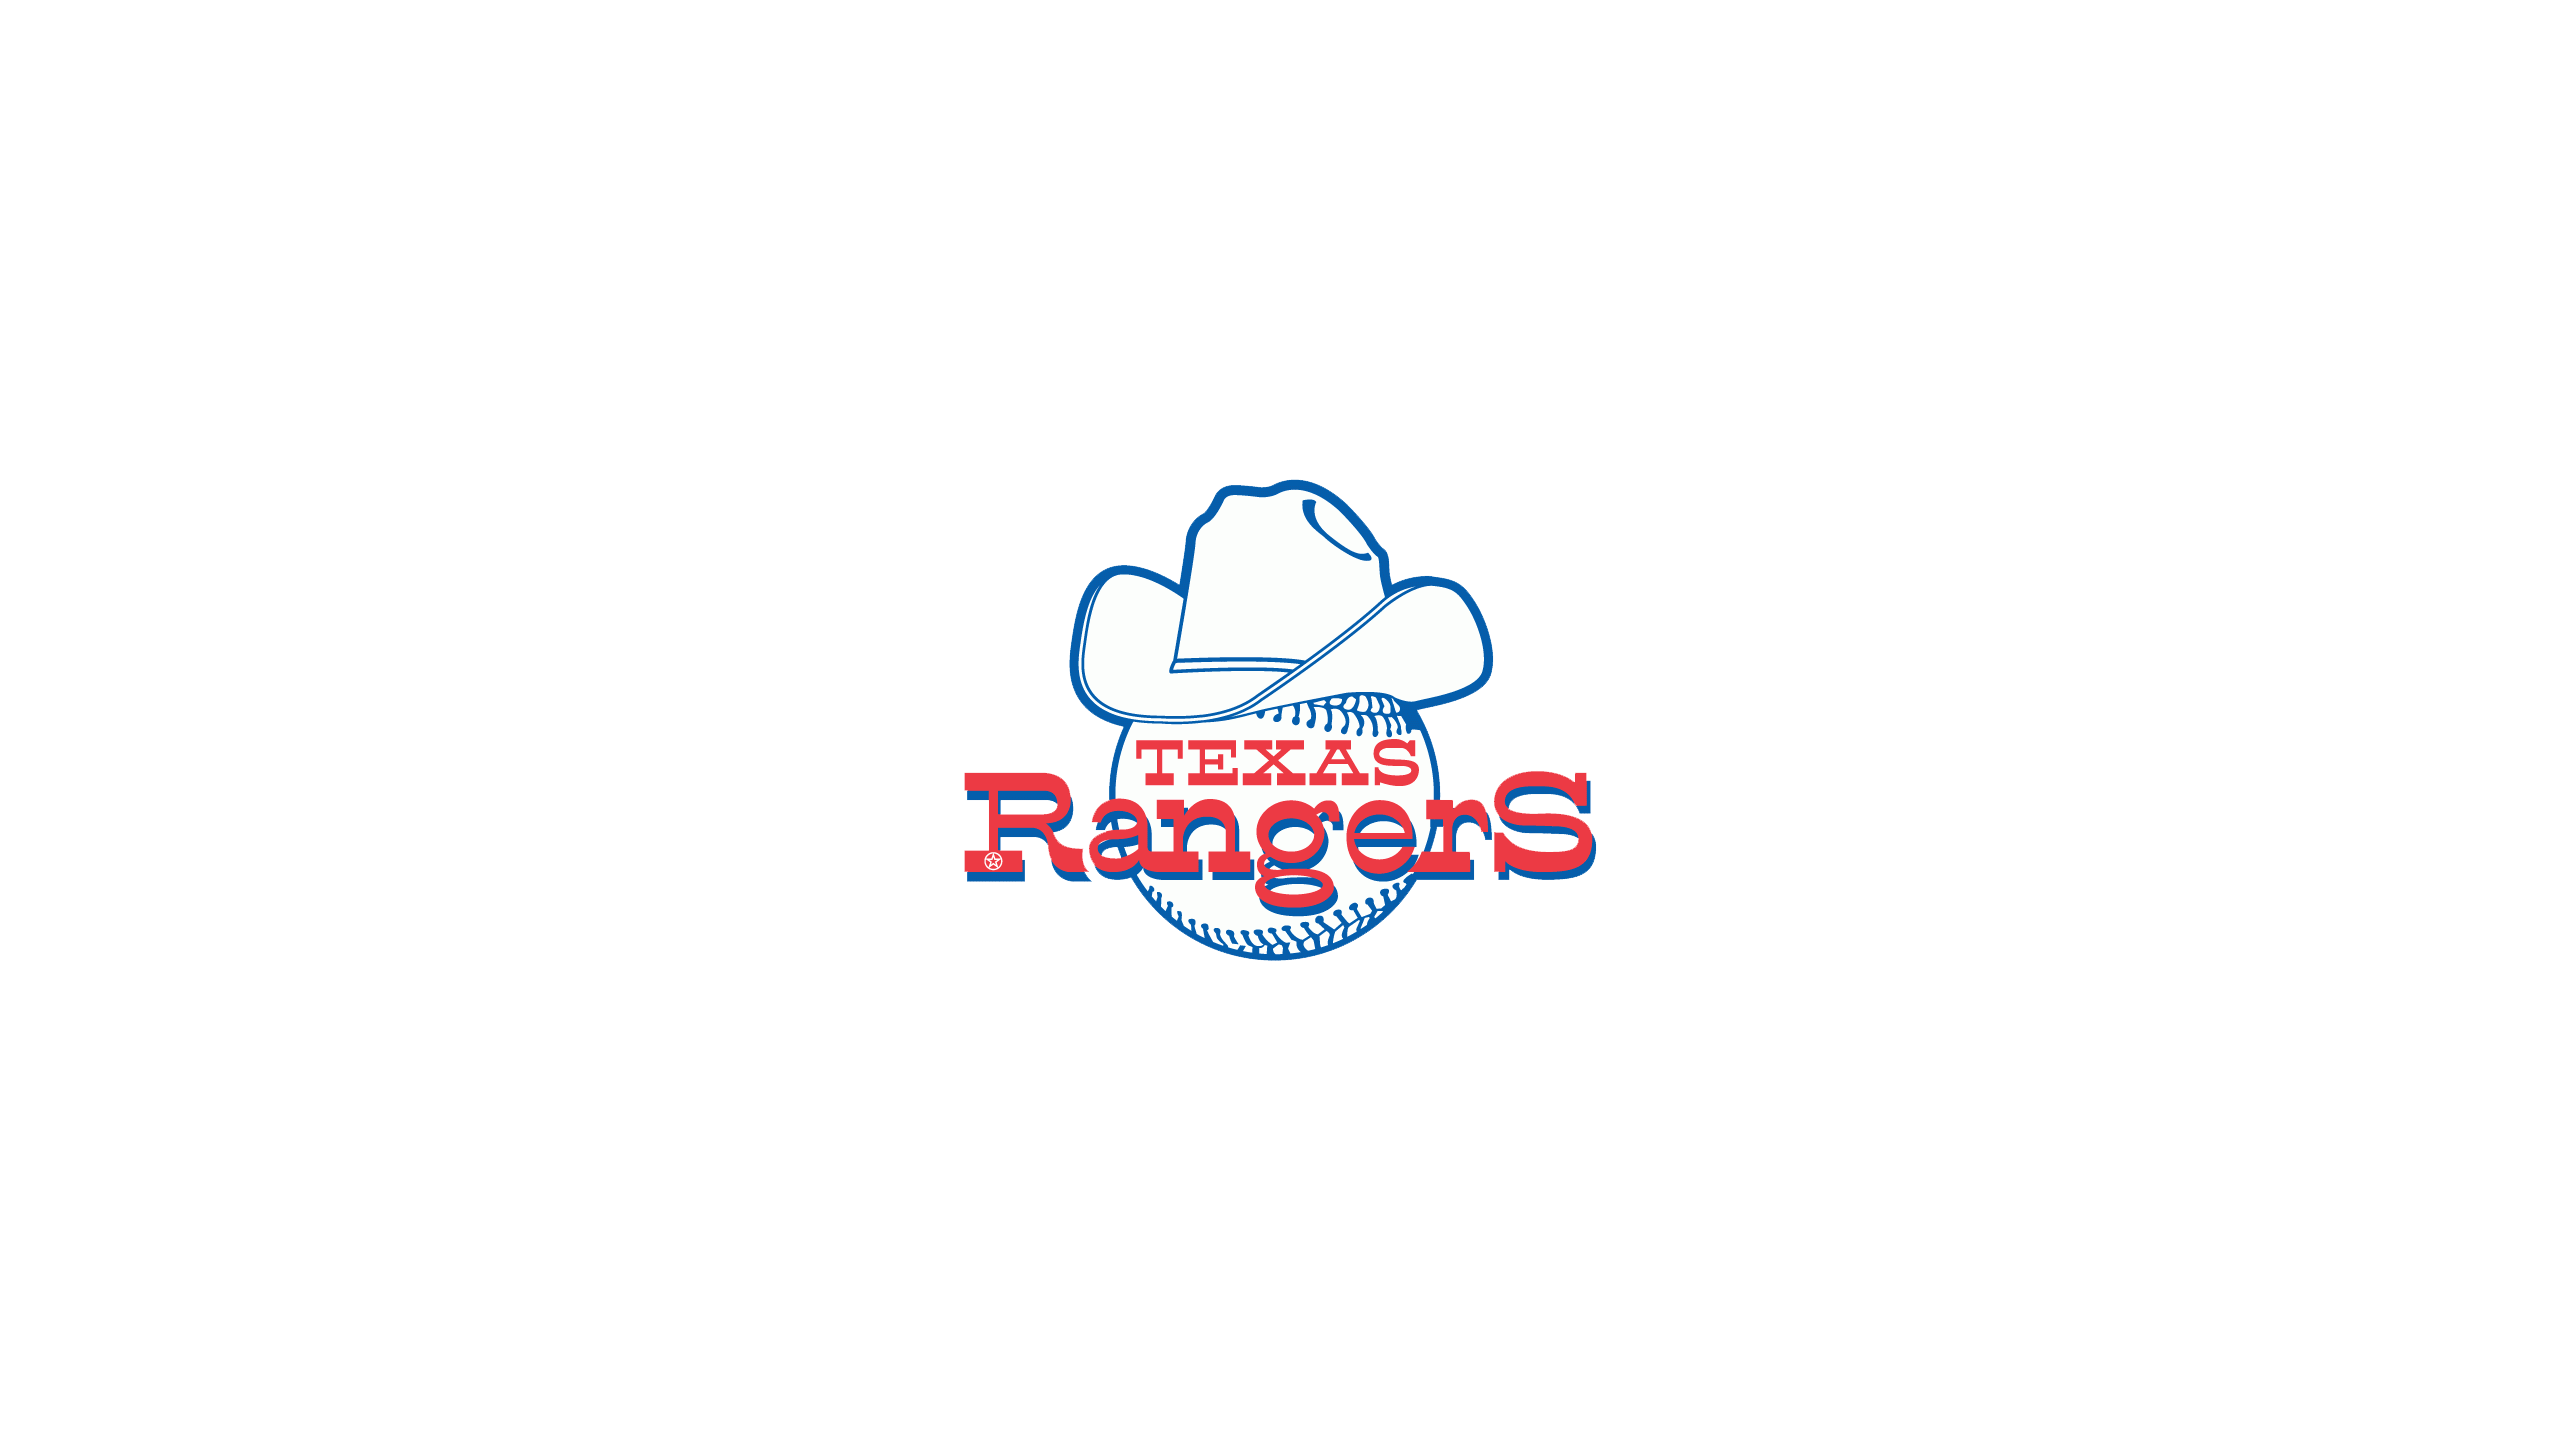 Texas Rangers (Old School)